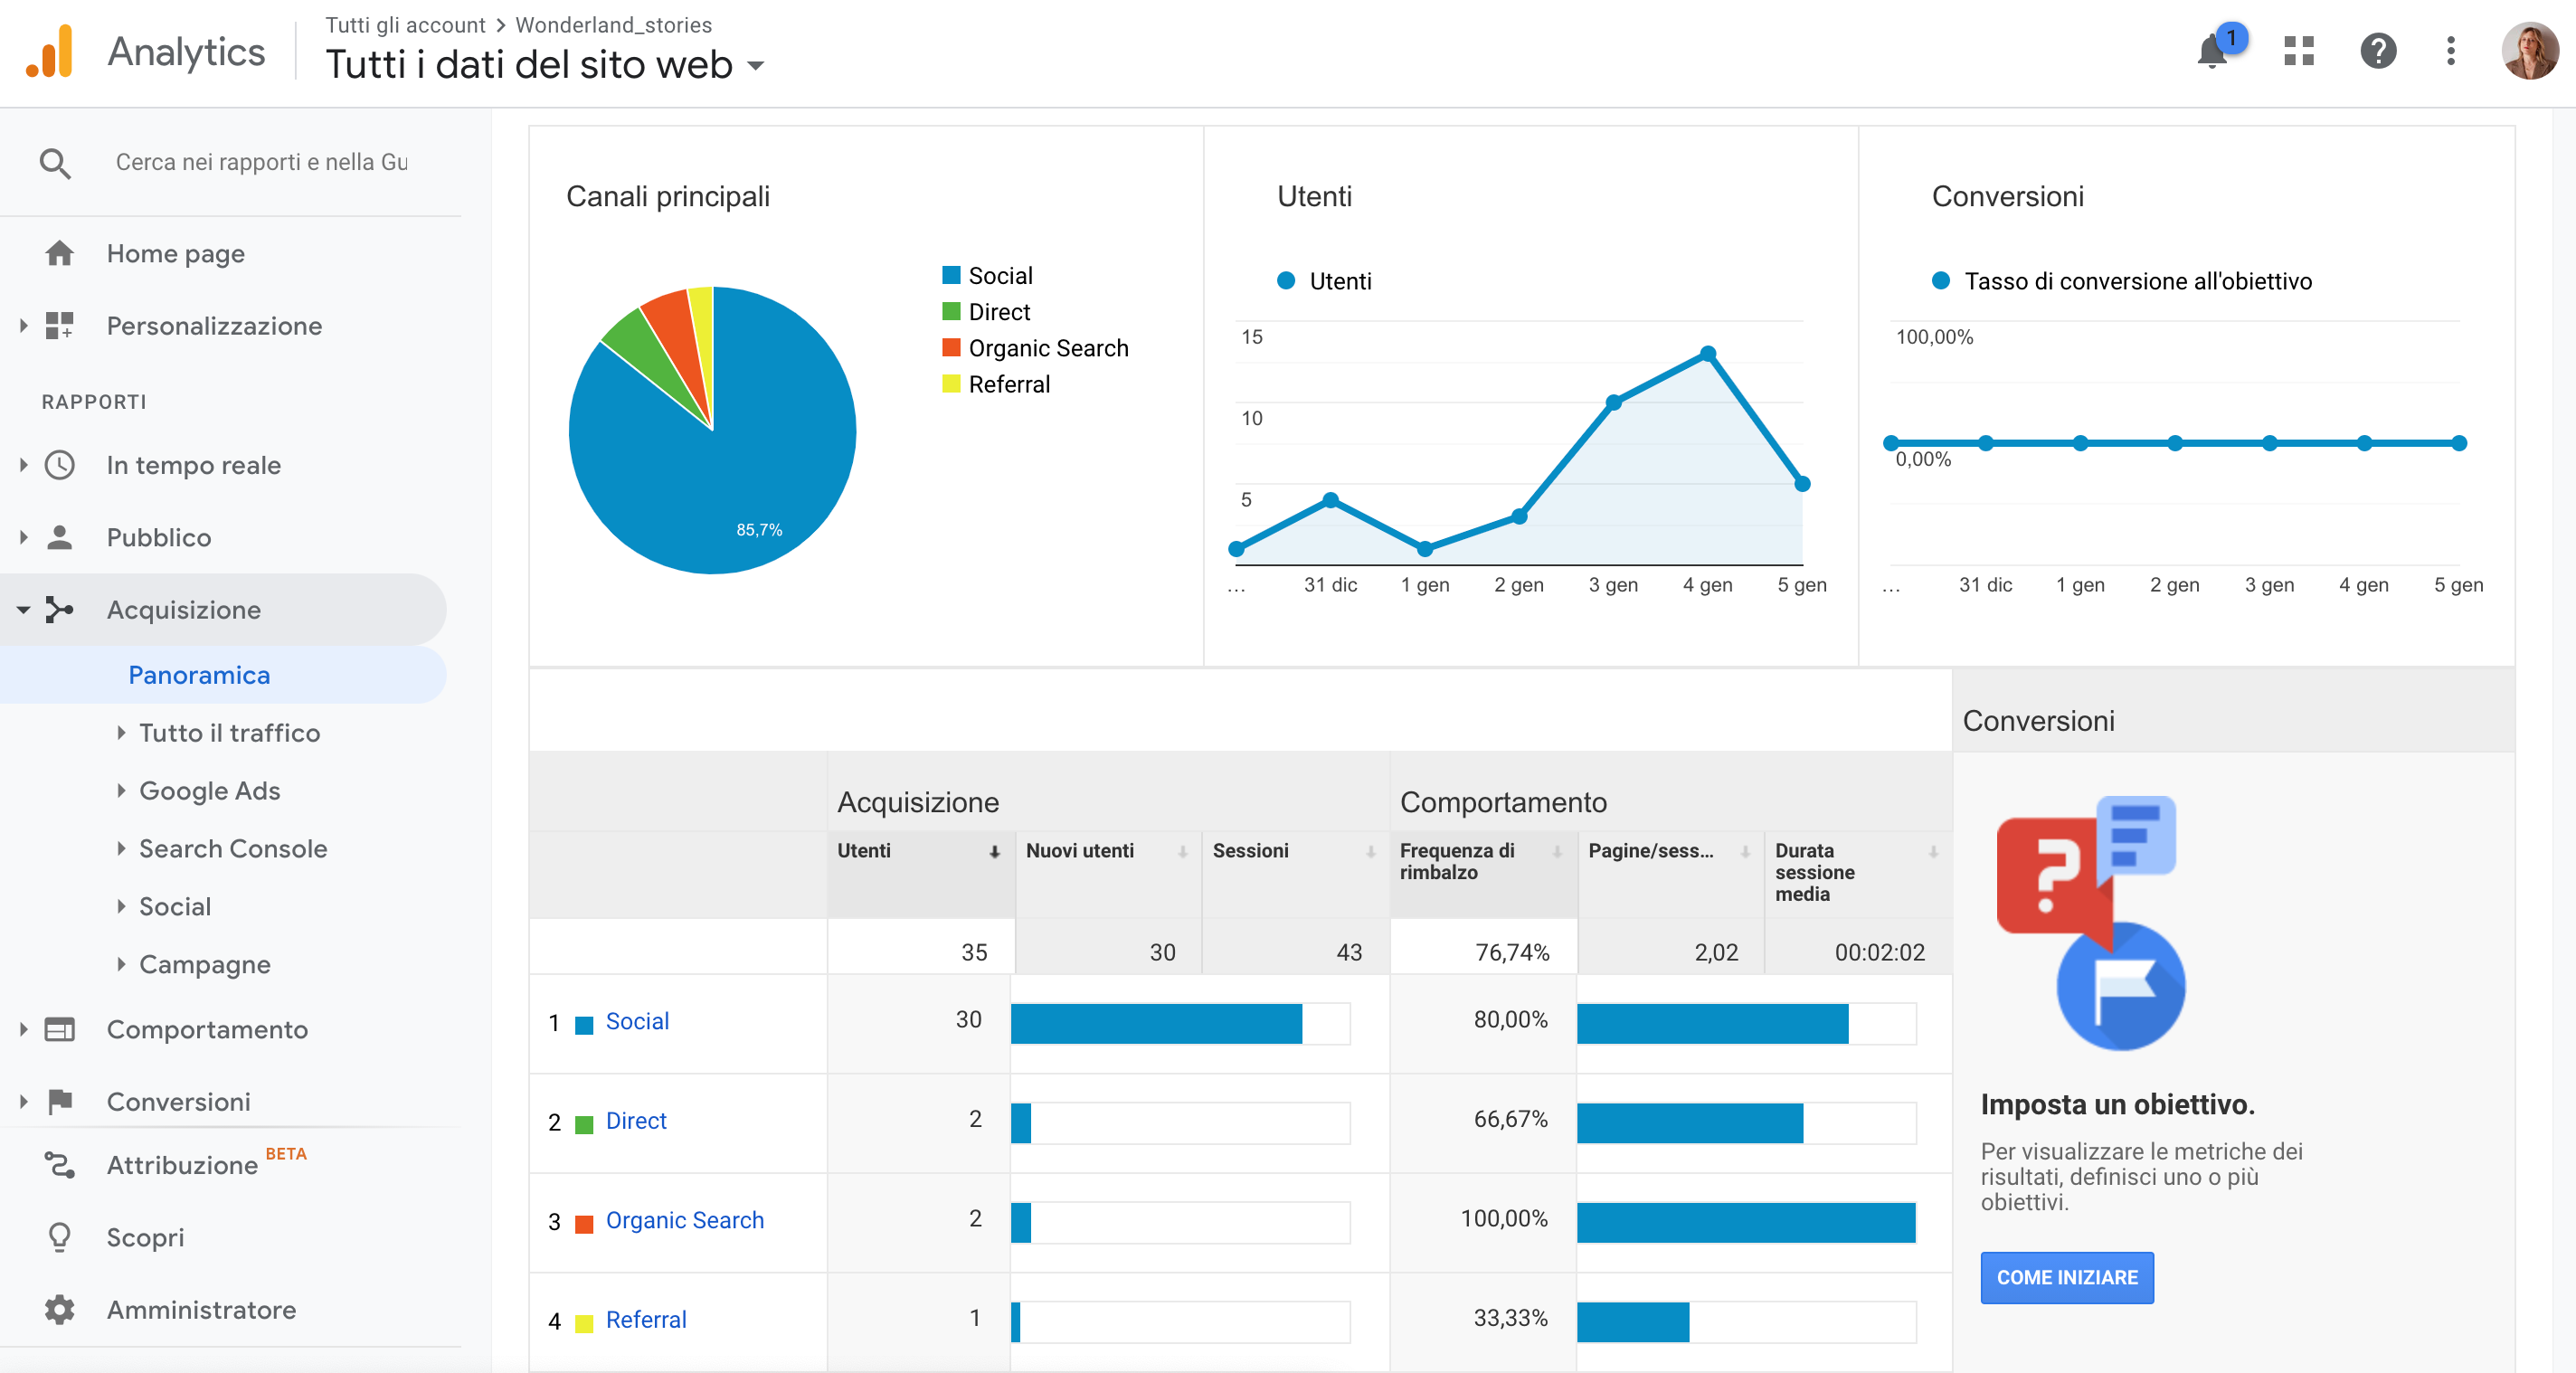 analytics acquisizione dati